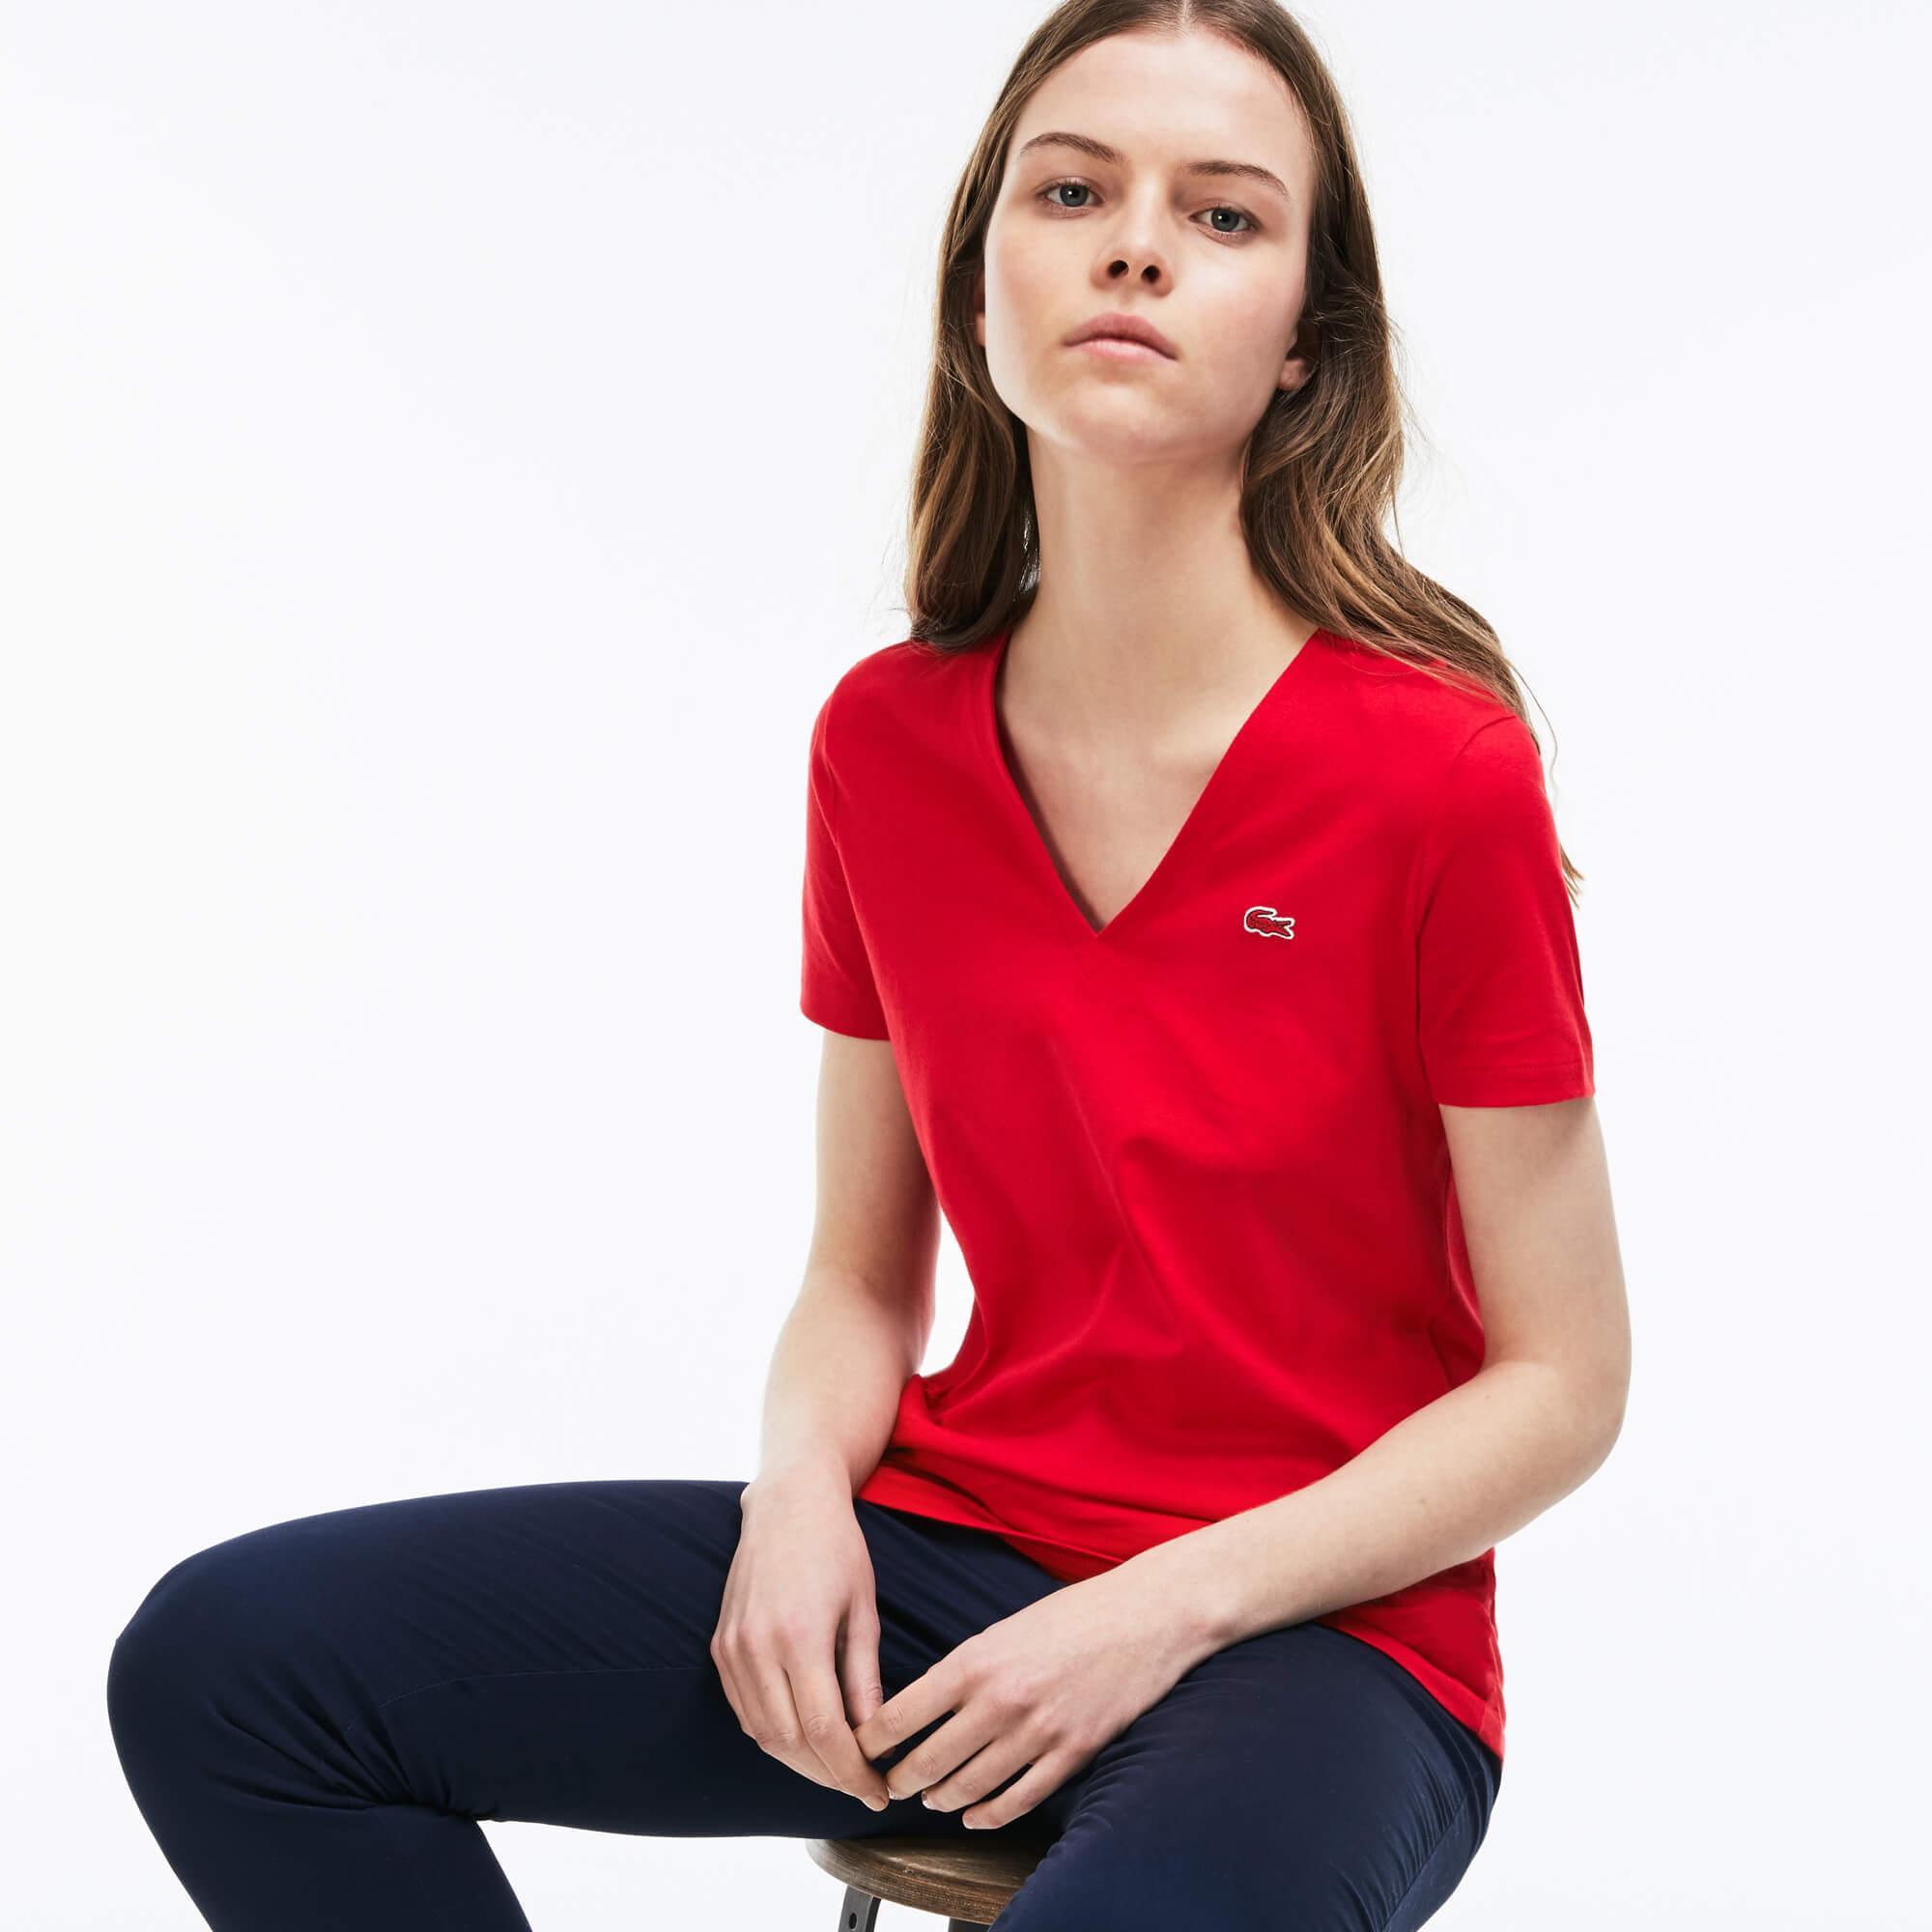 Lacoste Kadın V Yaka Kırmızı T-Shirt